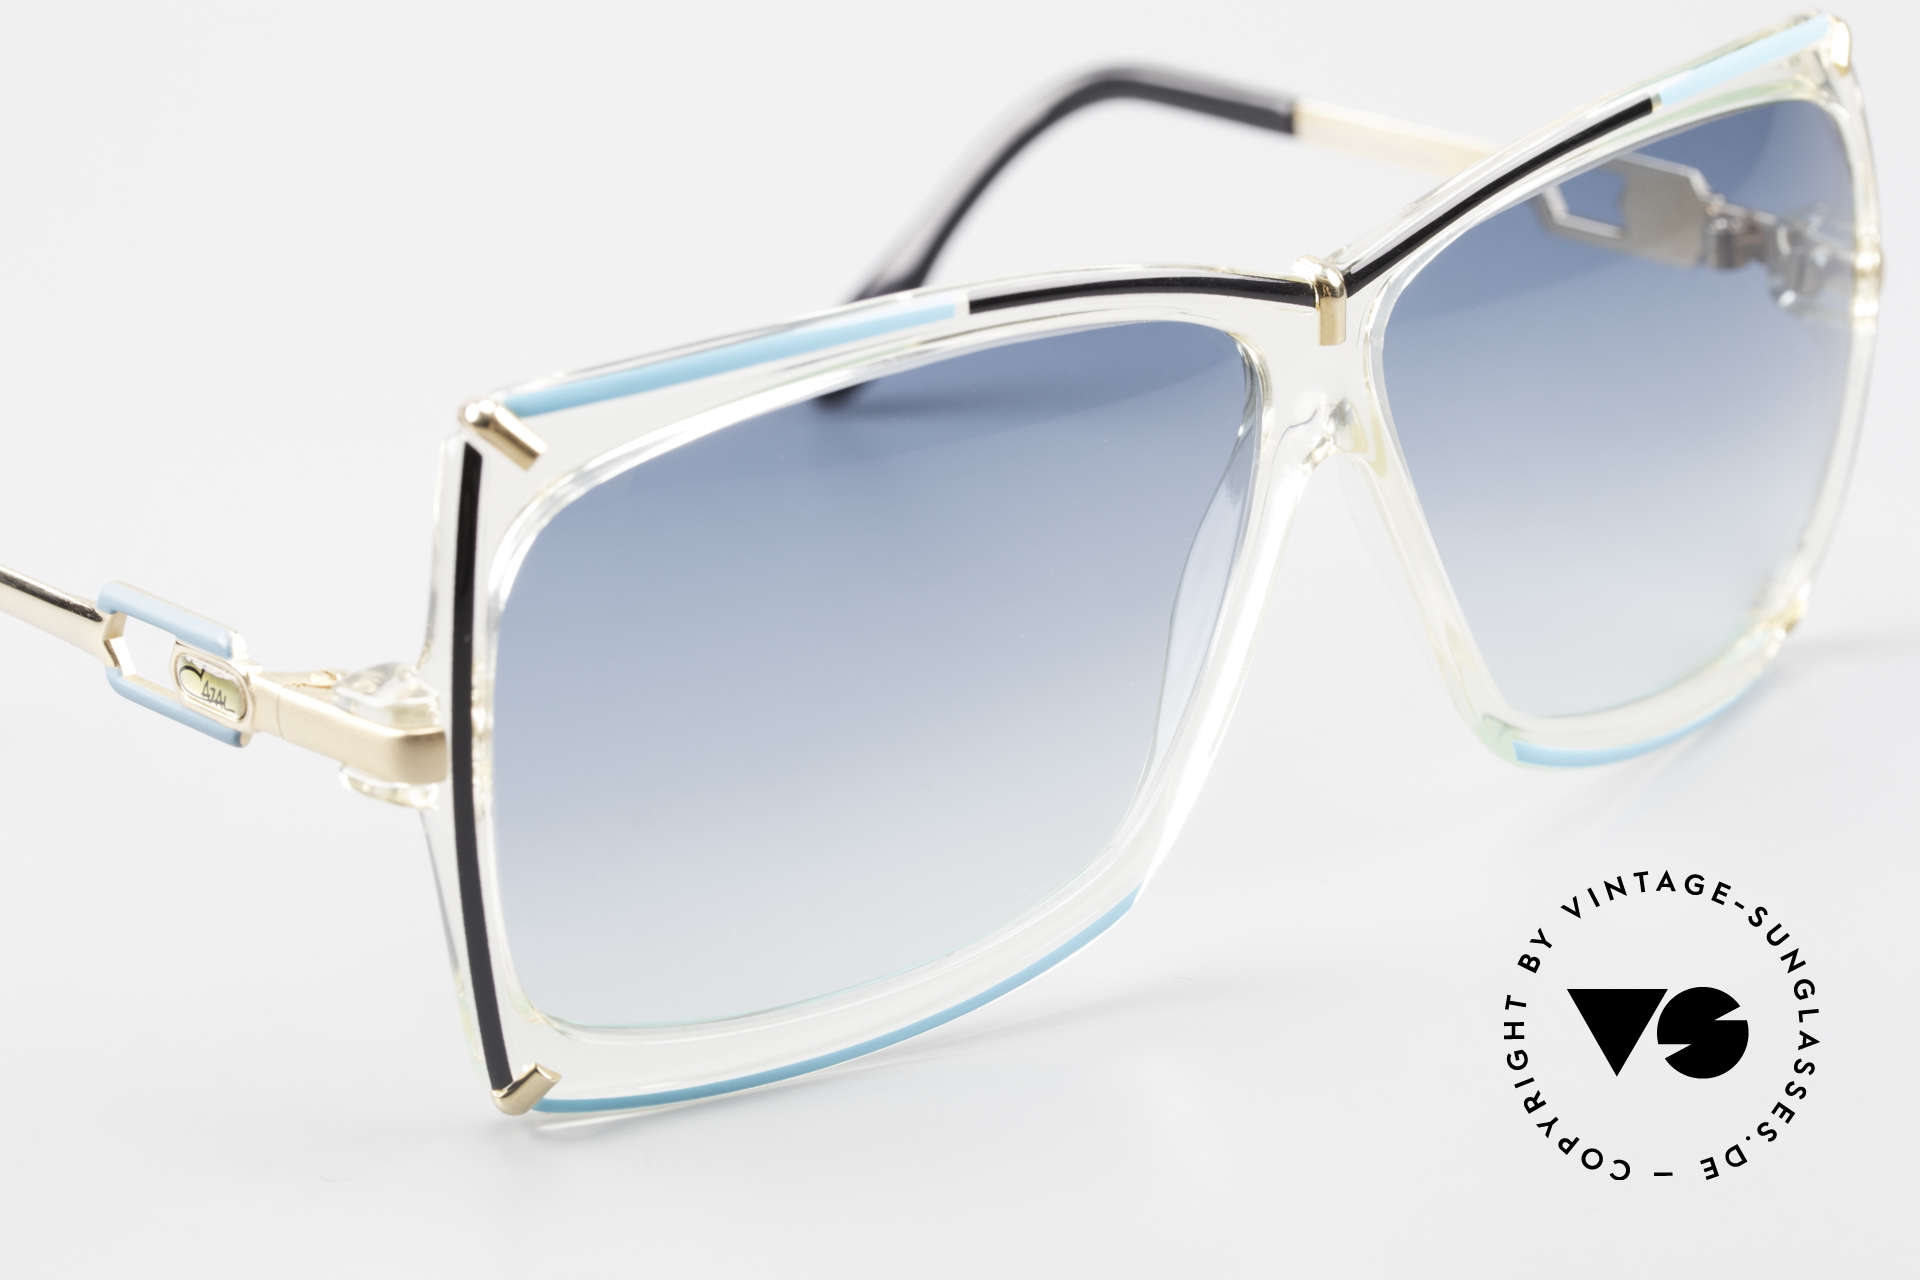 Cazal 864 Rare 80's Cazal XL Sunglasses, unworn (like all our vintage sunglasses by Cazal), Made for Women